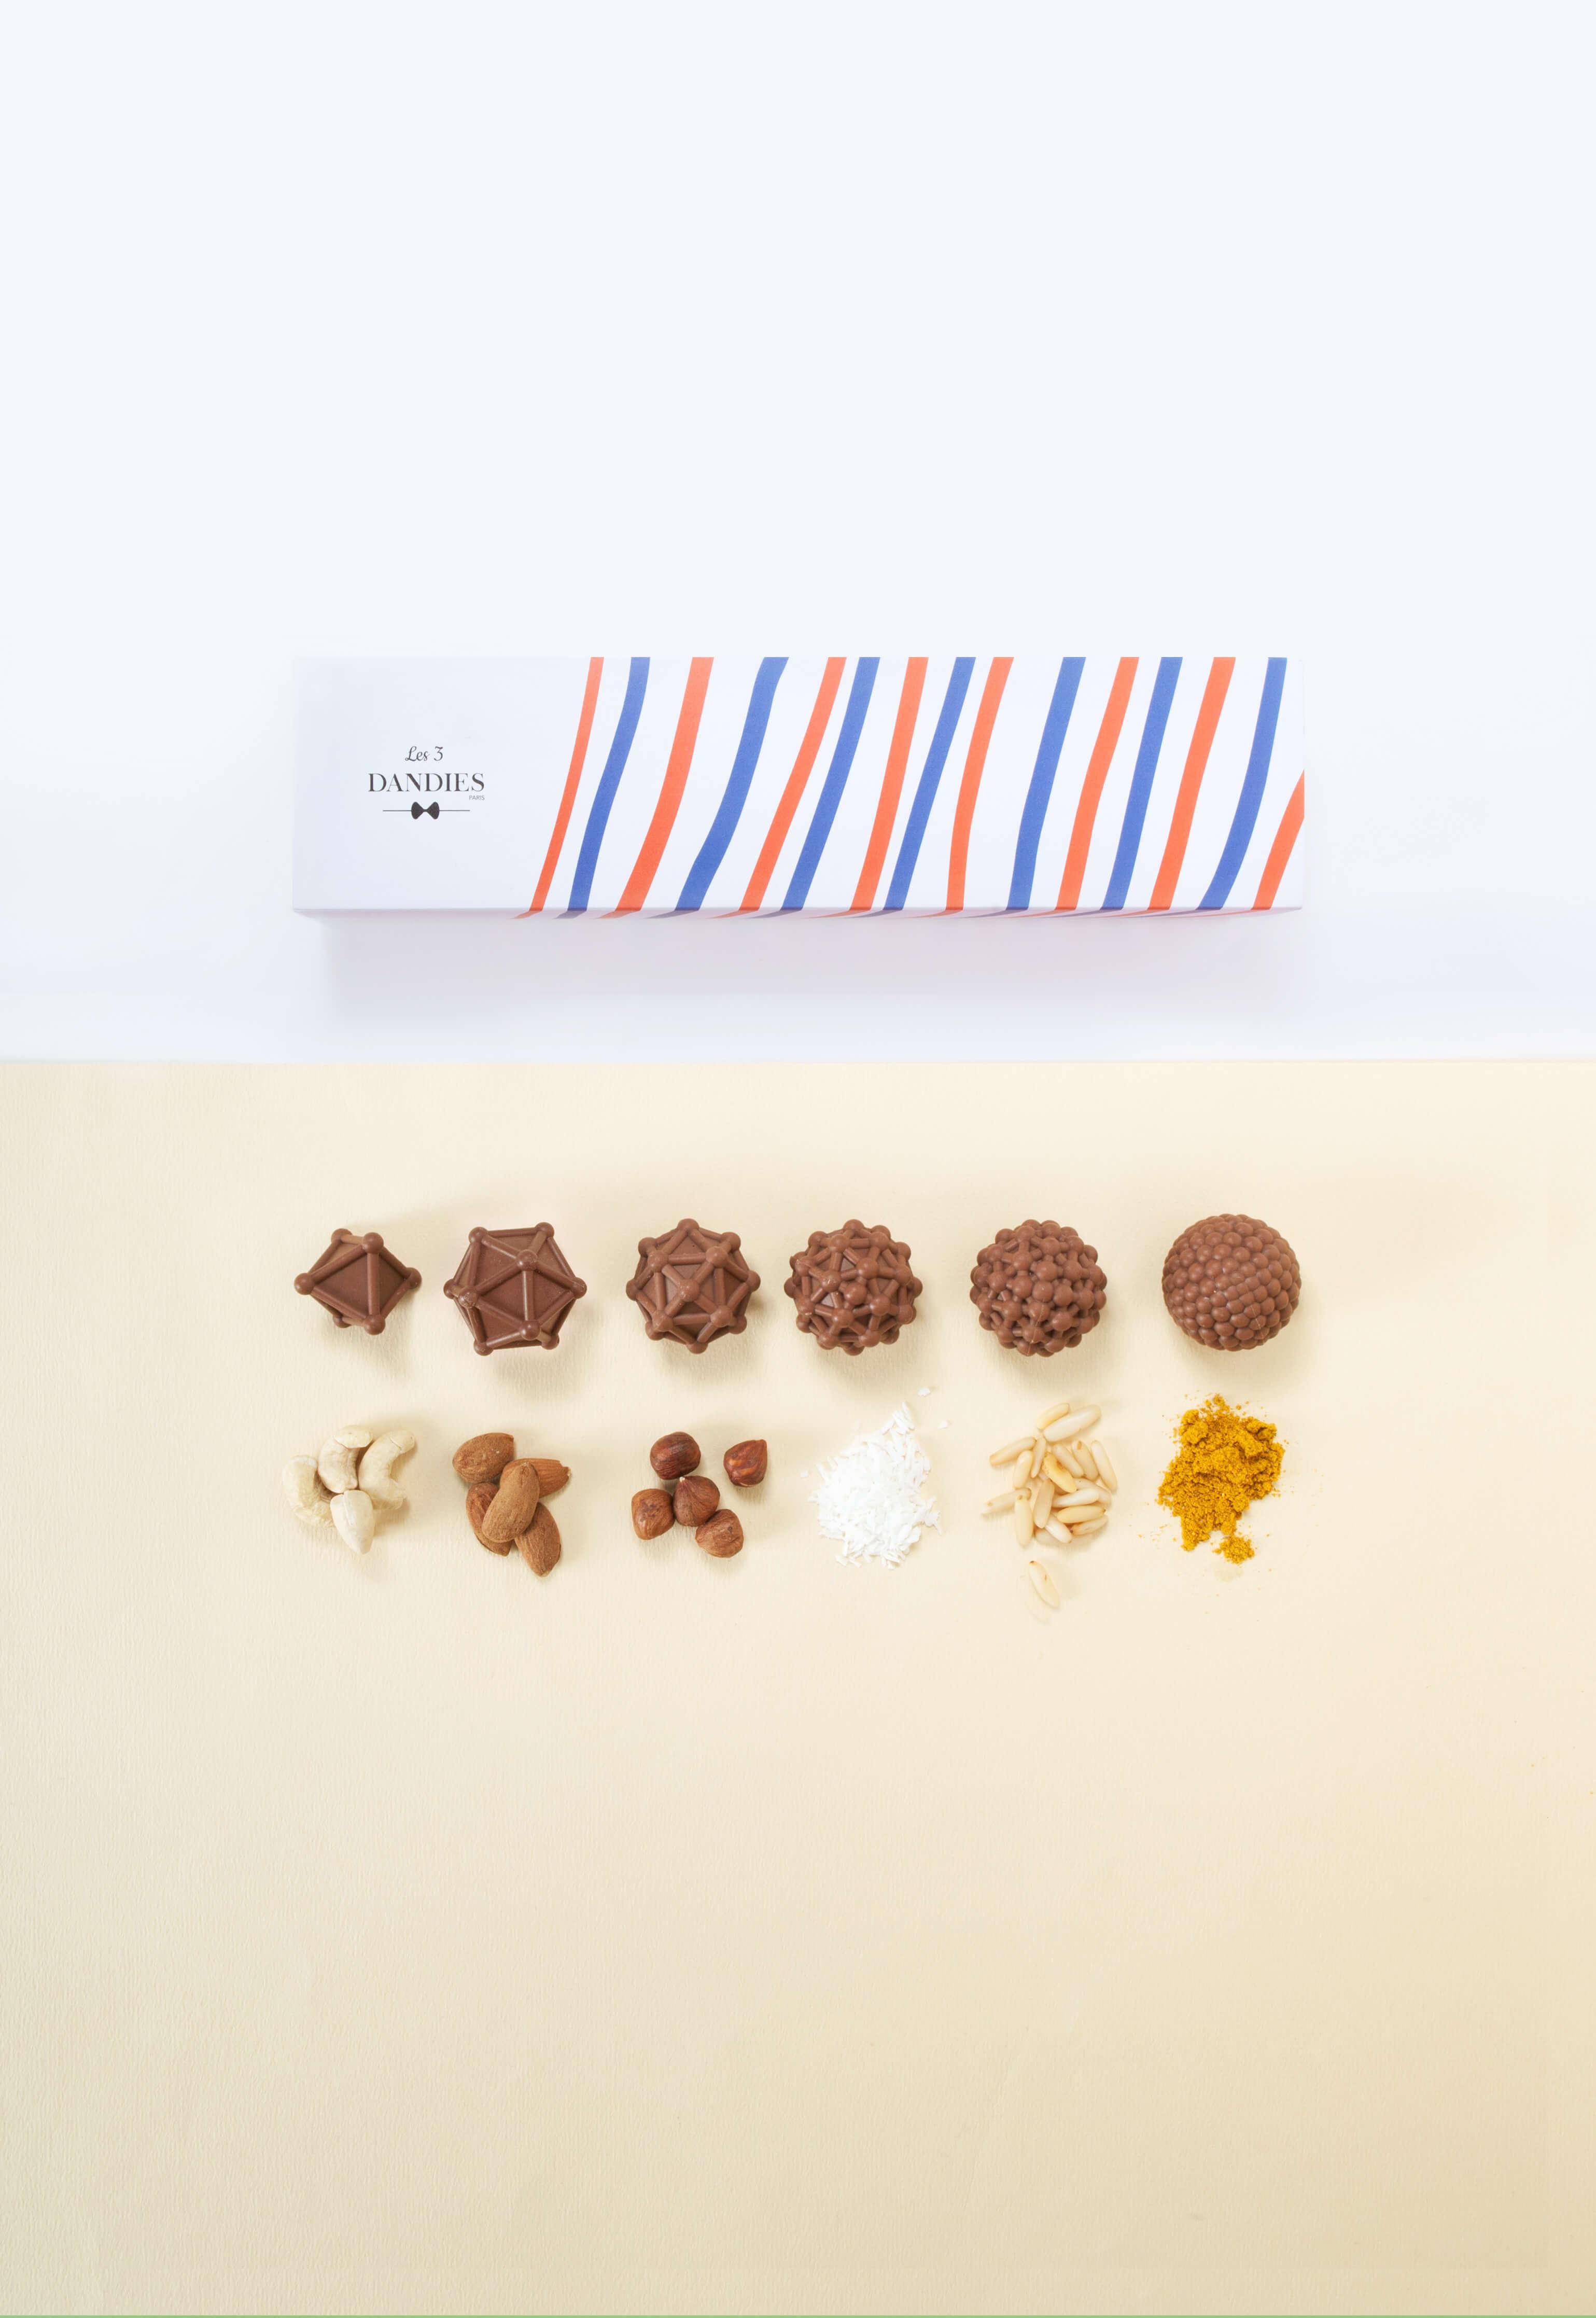 Chocolat 3D Les 3DANDIES